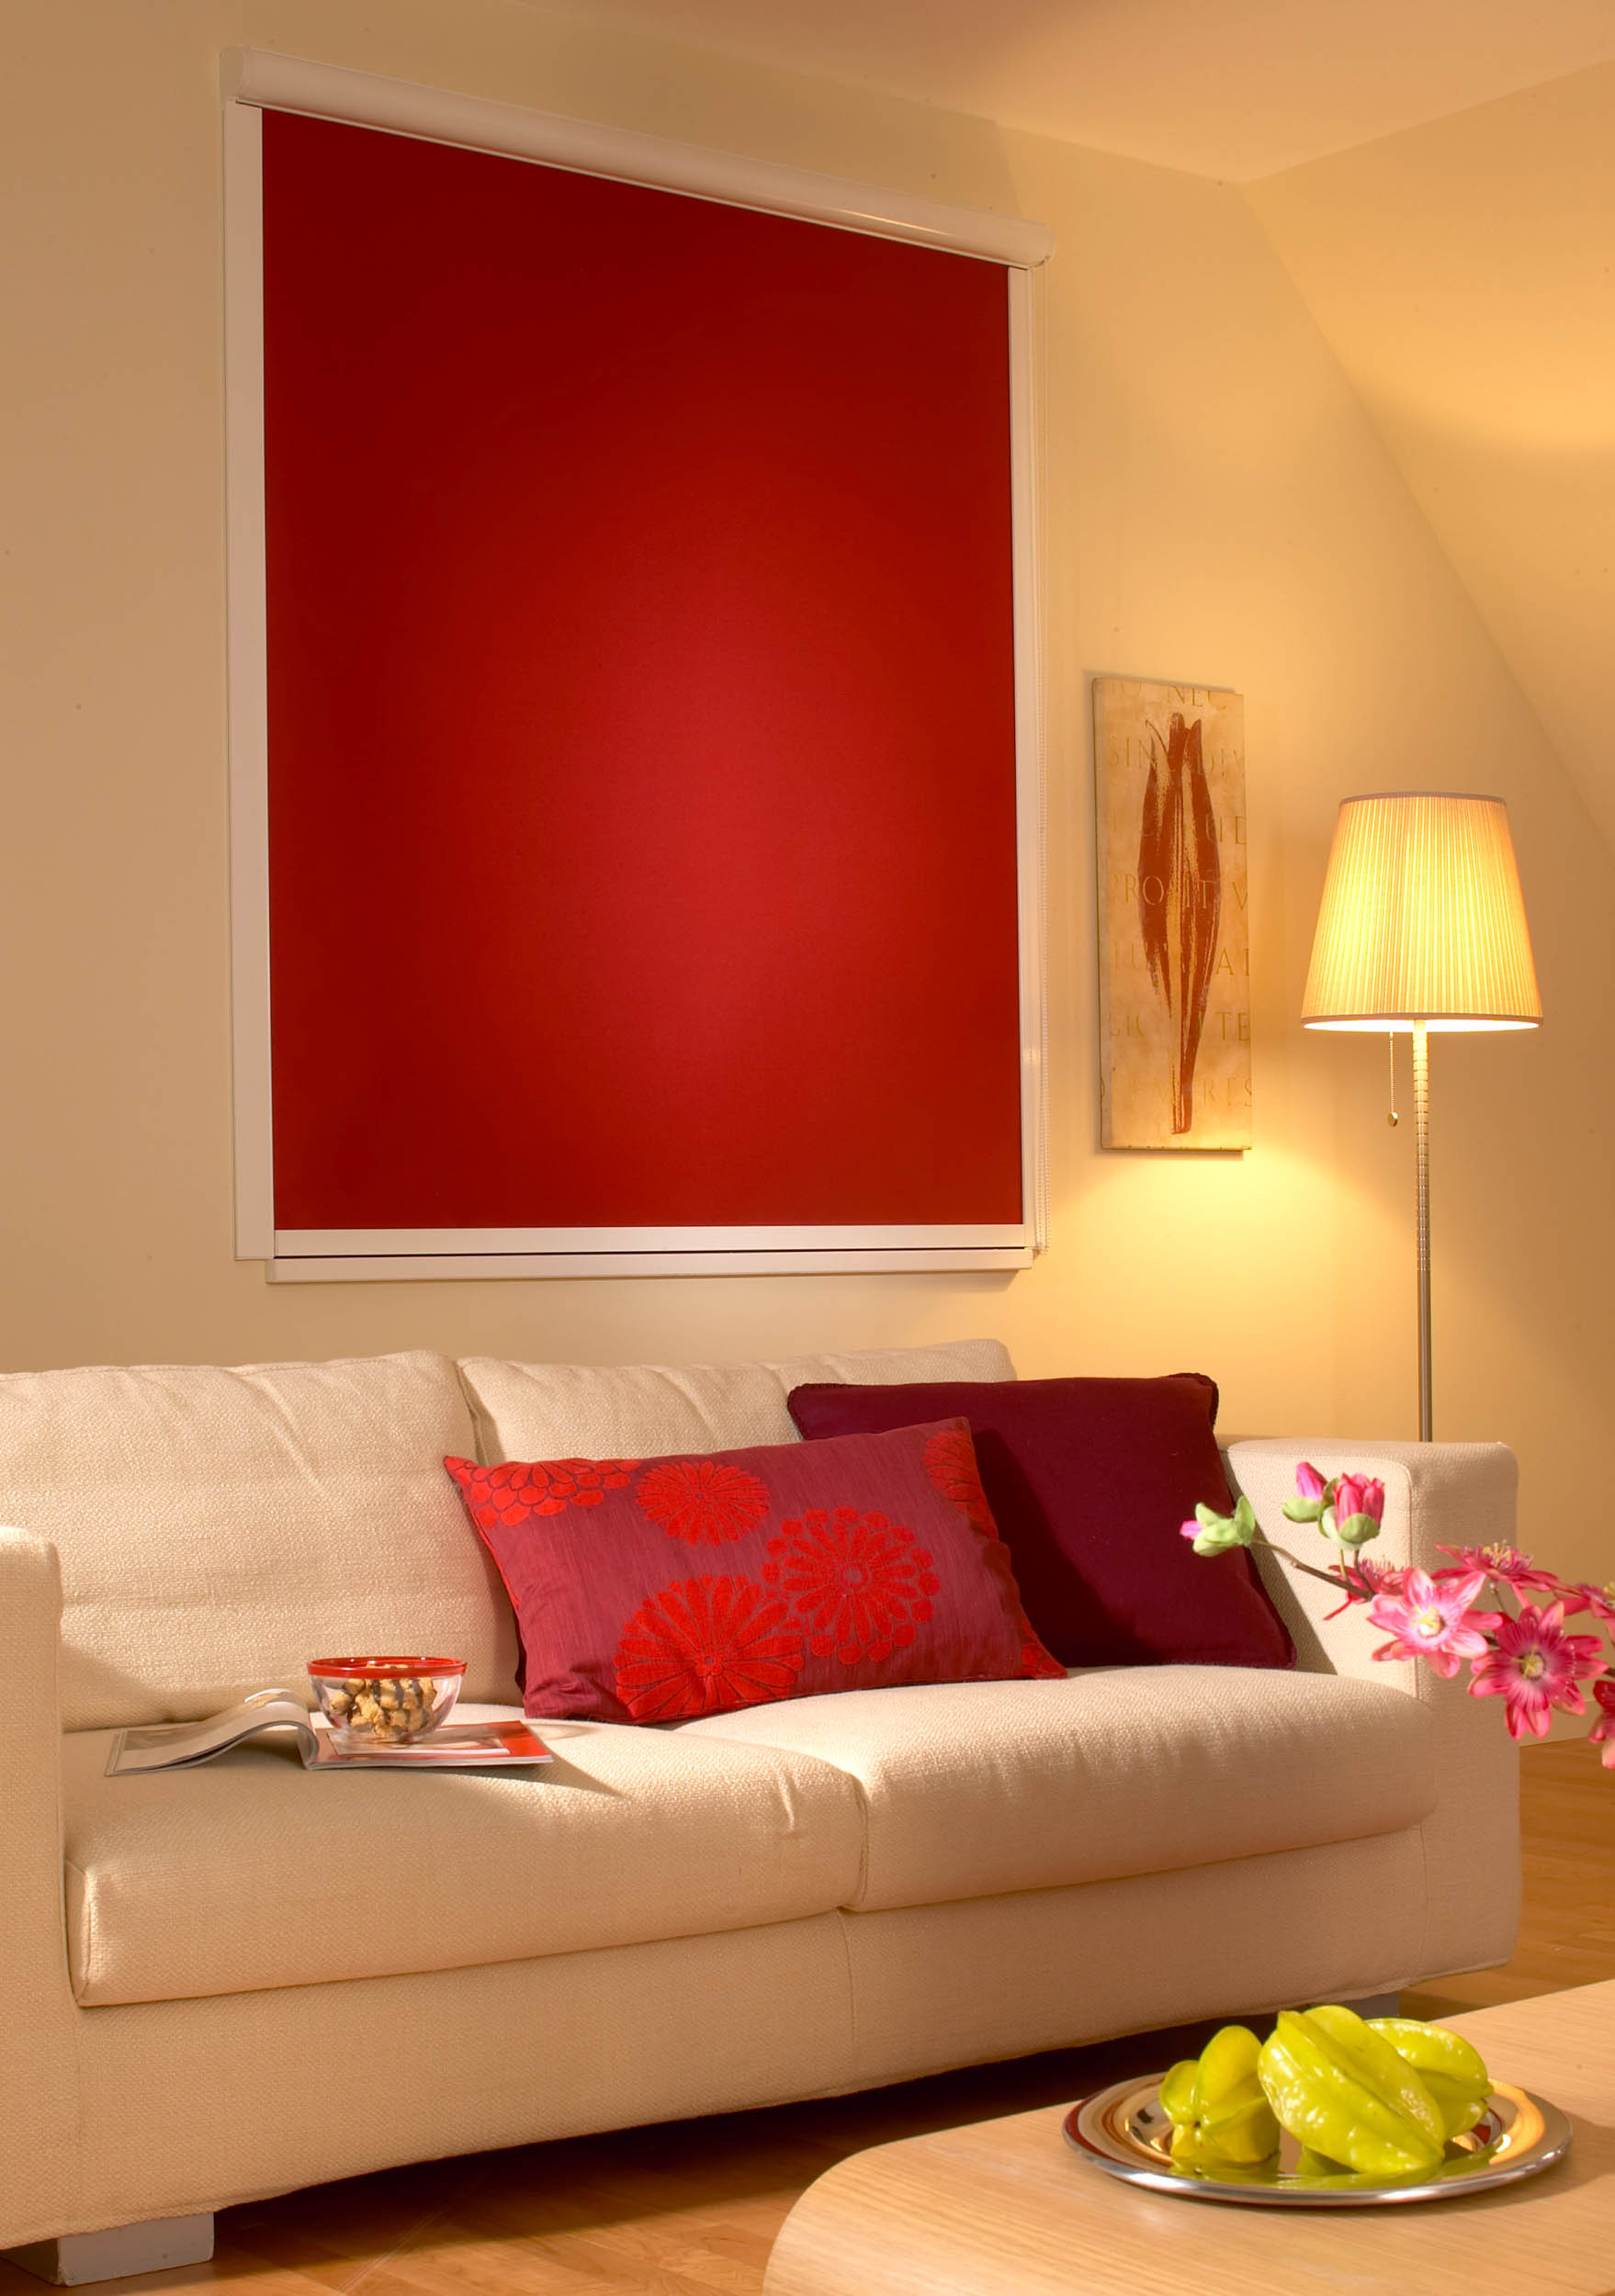 rollos in frankfurt oder leipzig gesucht abc jalousien. Black Bedroom Furniture Sets. Home Design Ideas